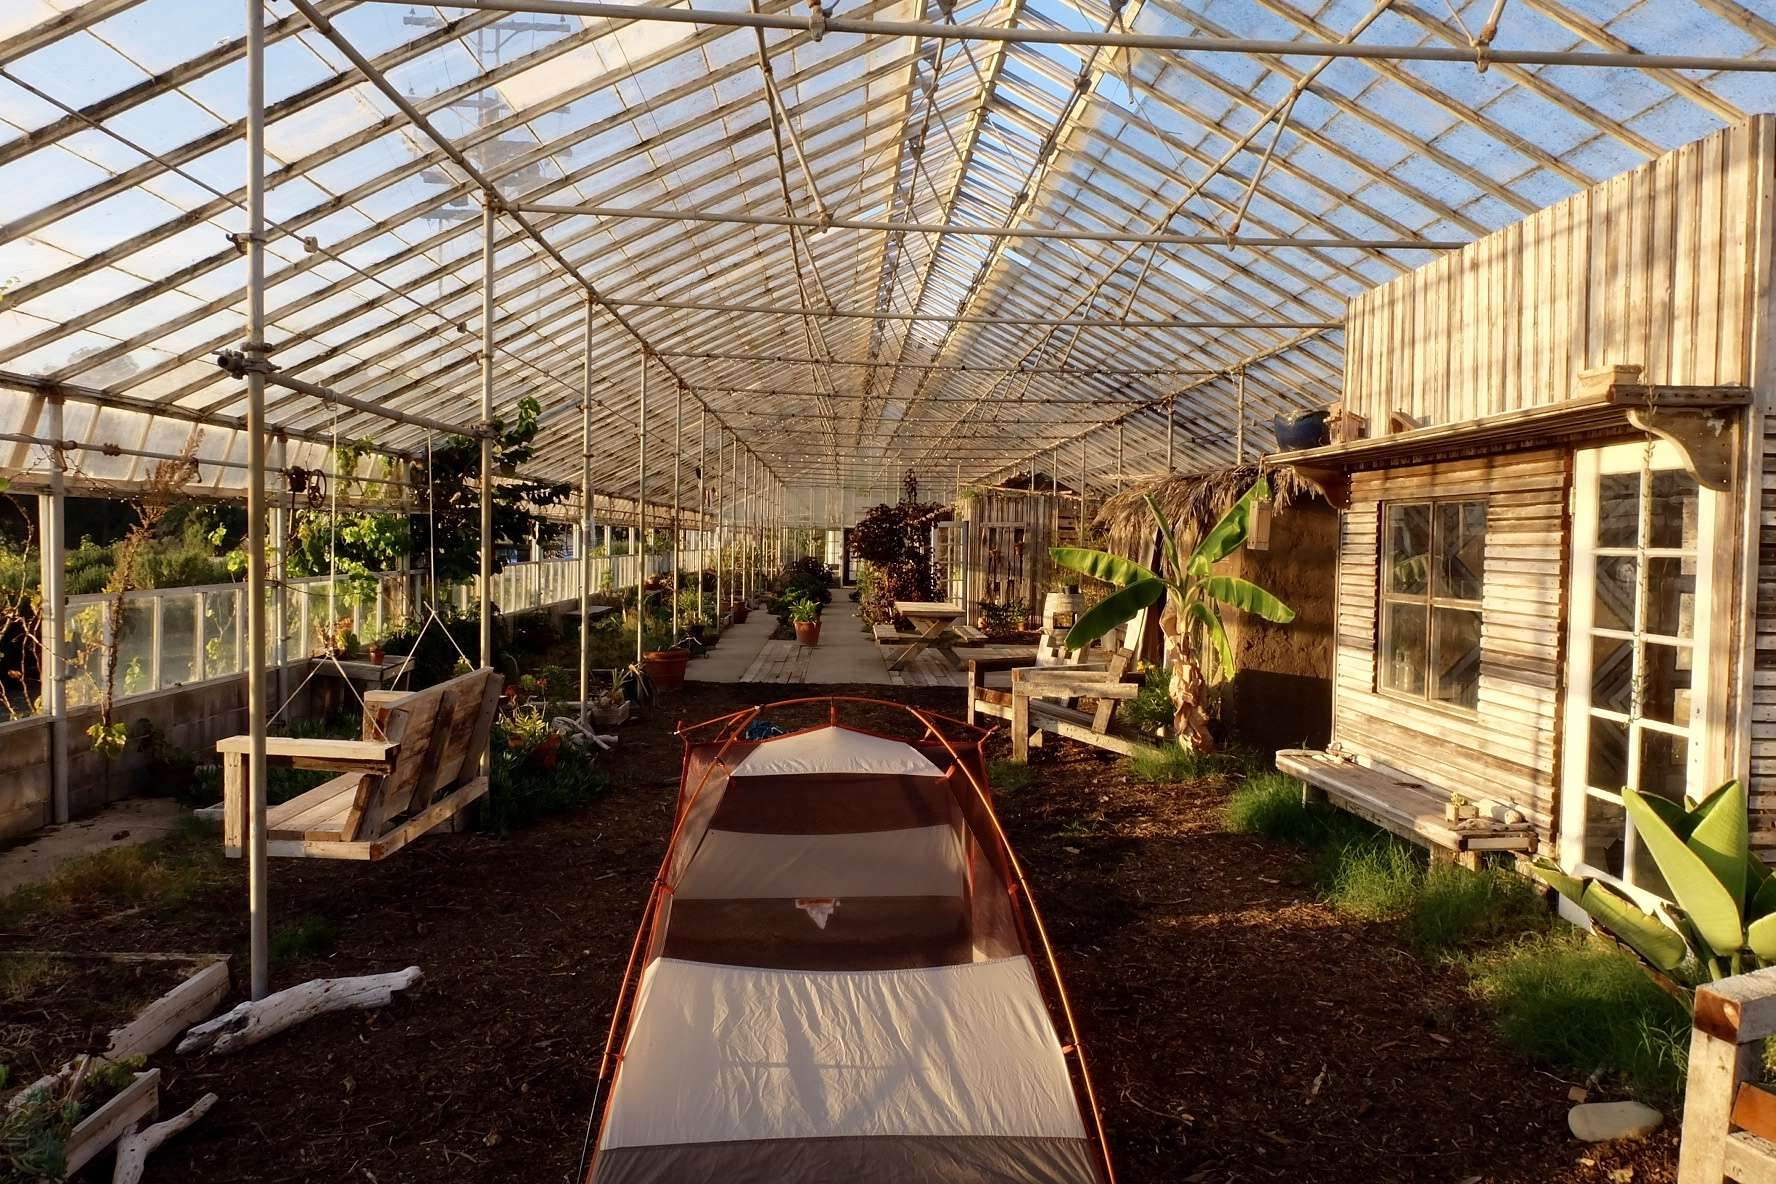 Private Beach Farm, Private Beach Farm, CA: 115 Hipcamper reviews ...